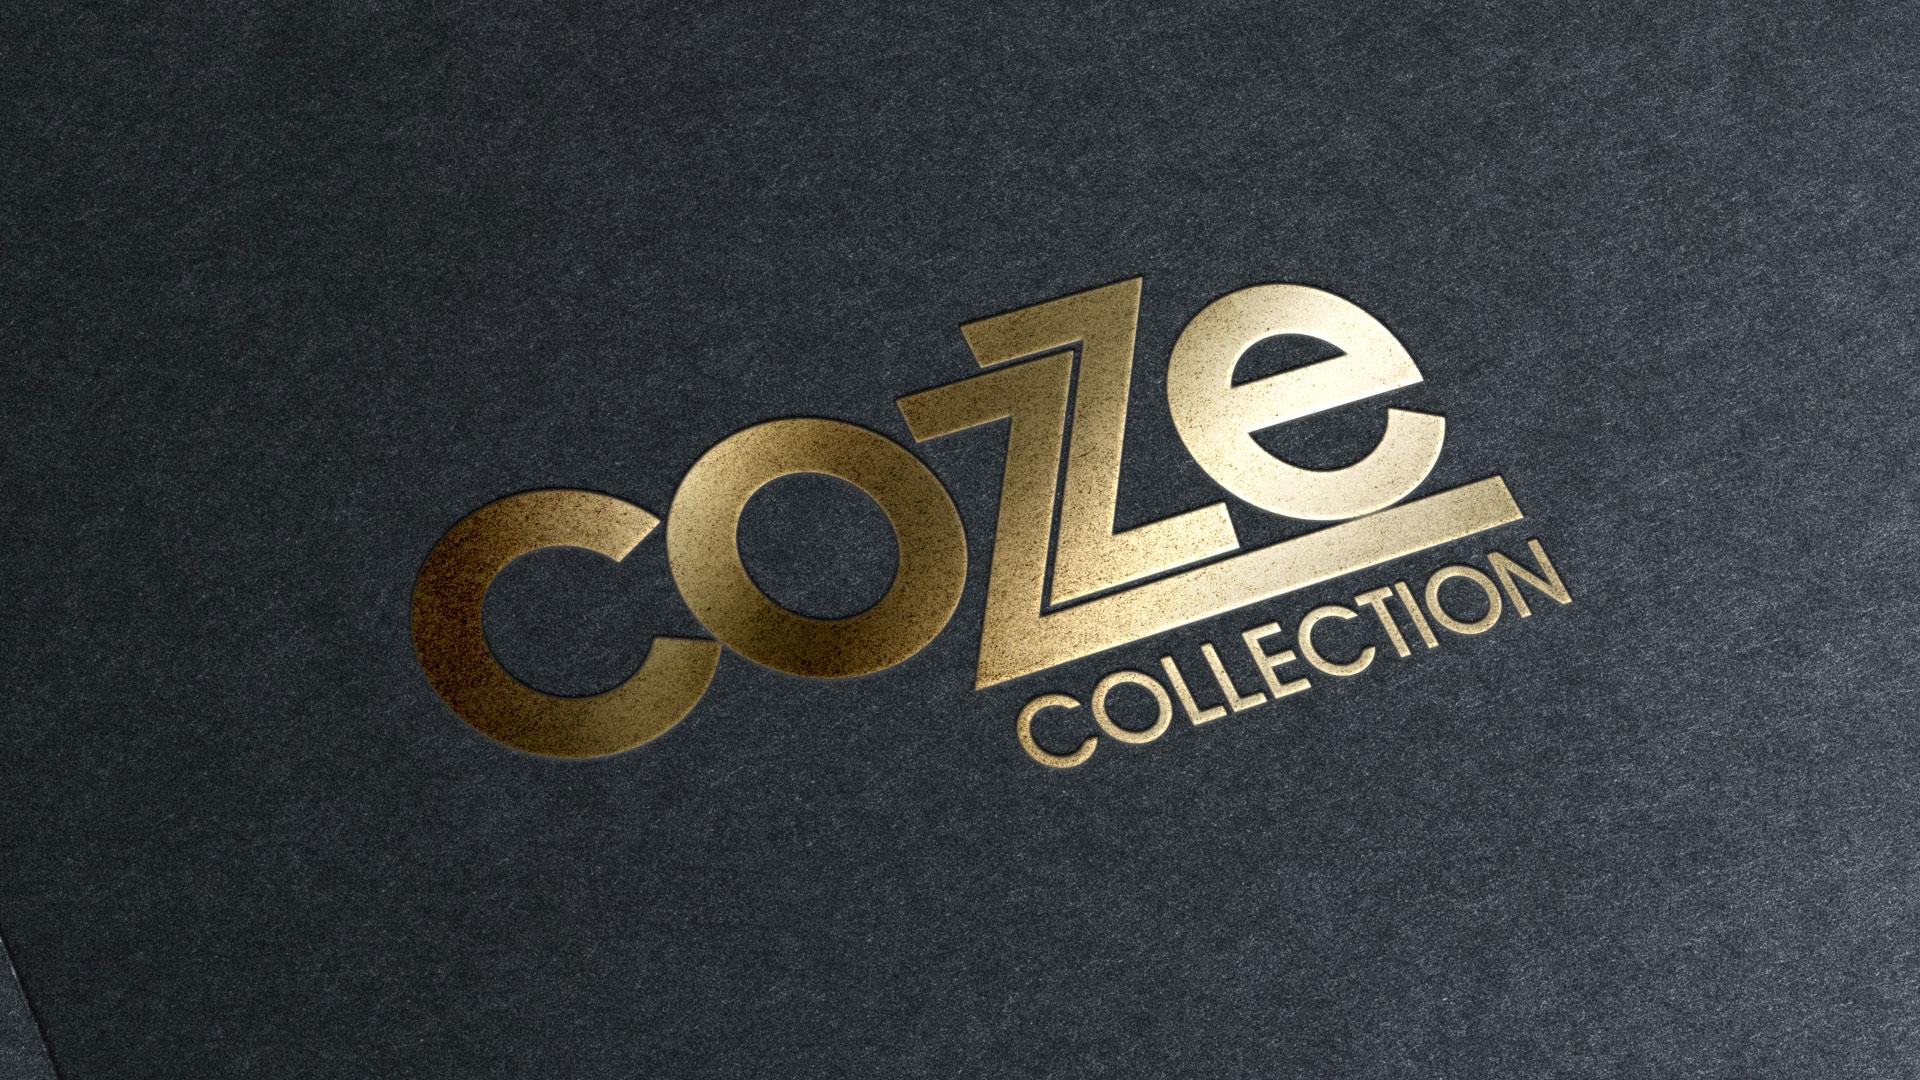 Cozze Collection